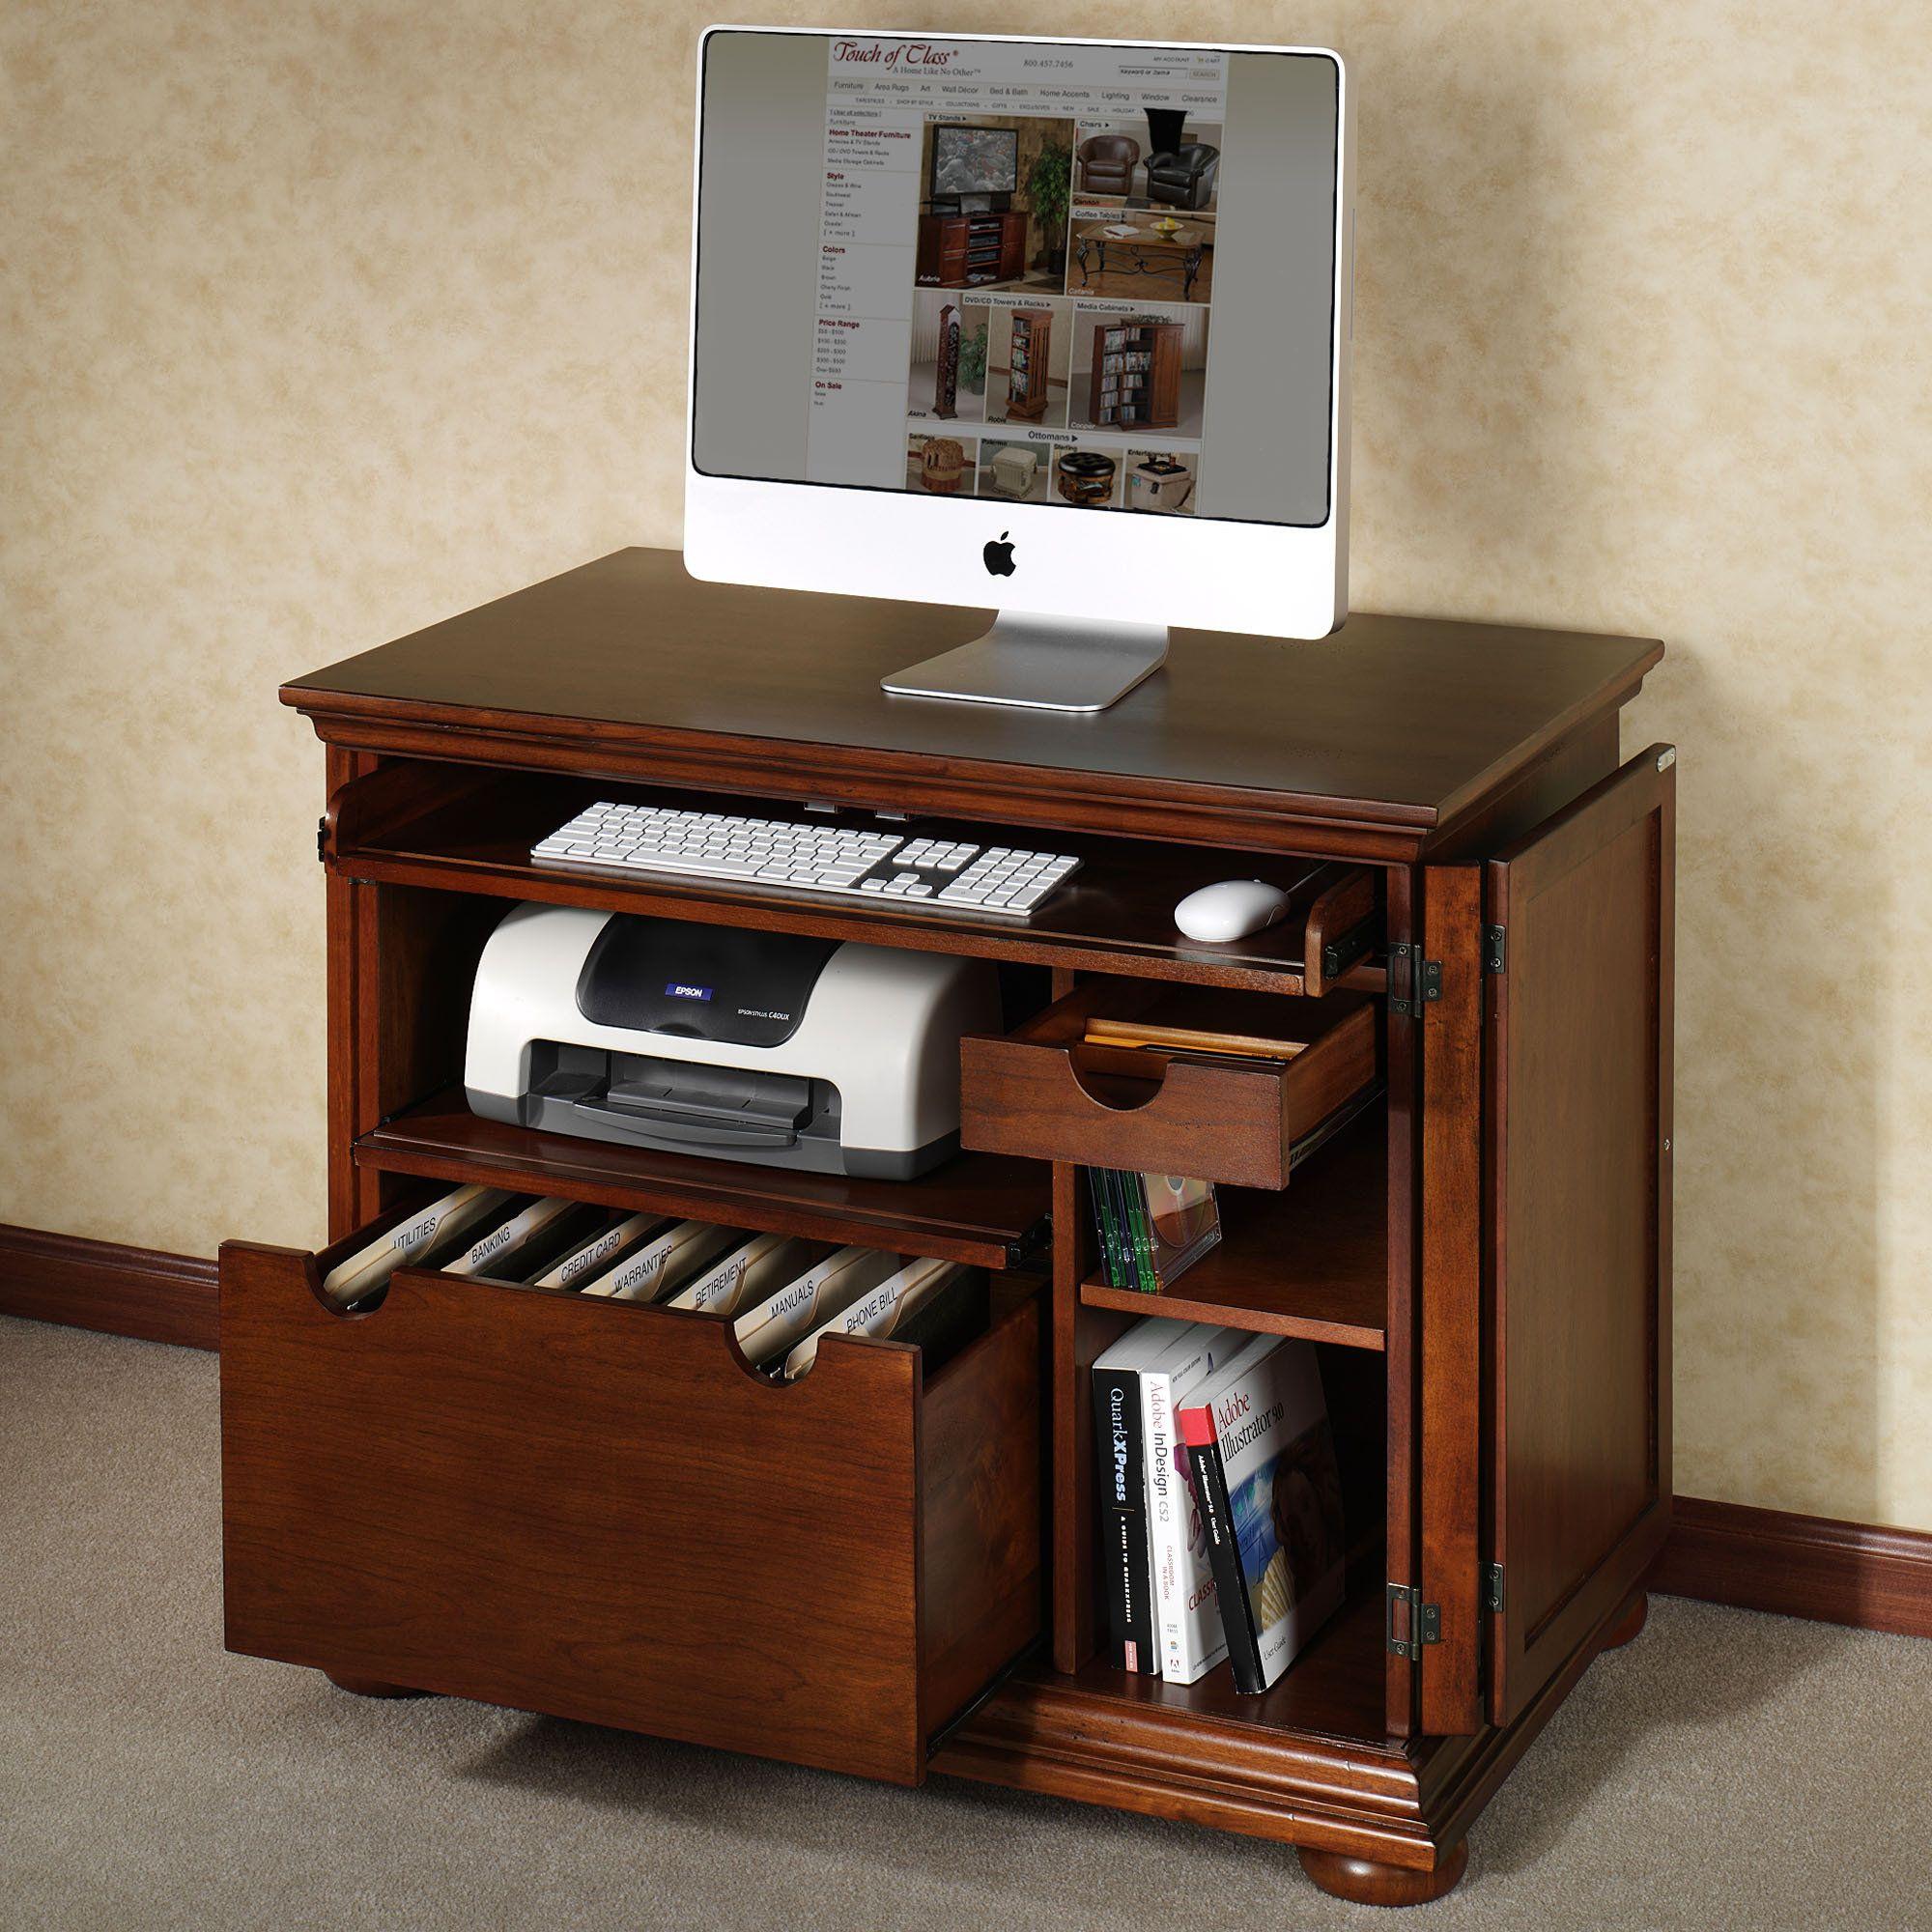 Compact Computer Desk Rv Living Pinterest Desks Drawer File Cabinet Small